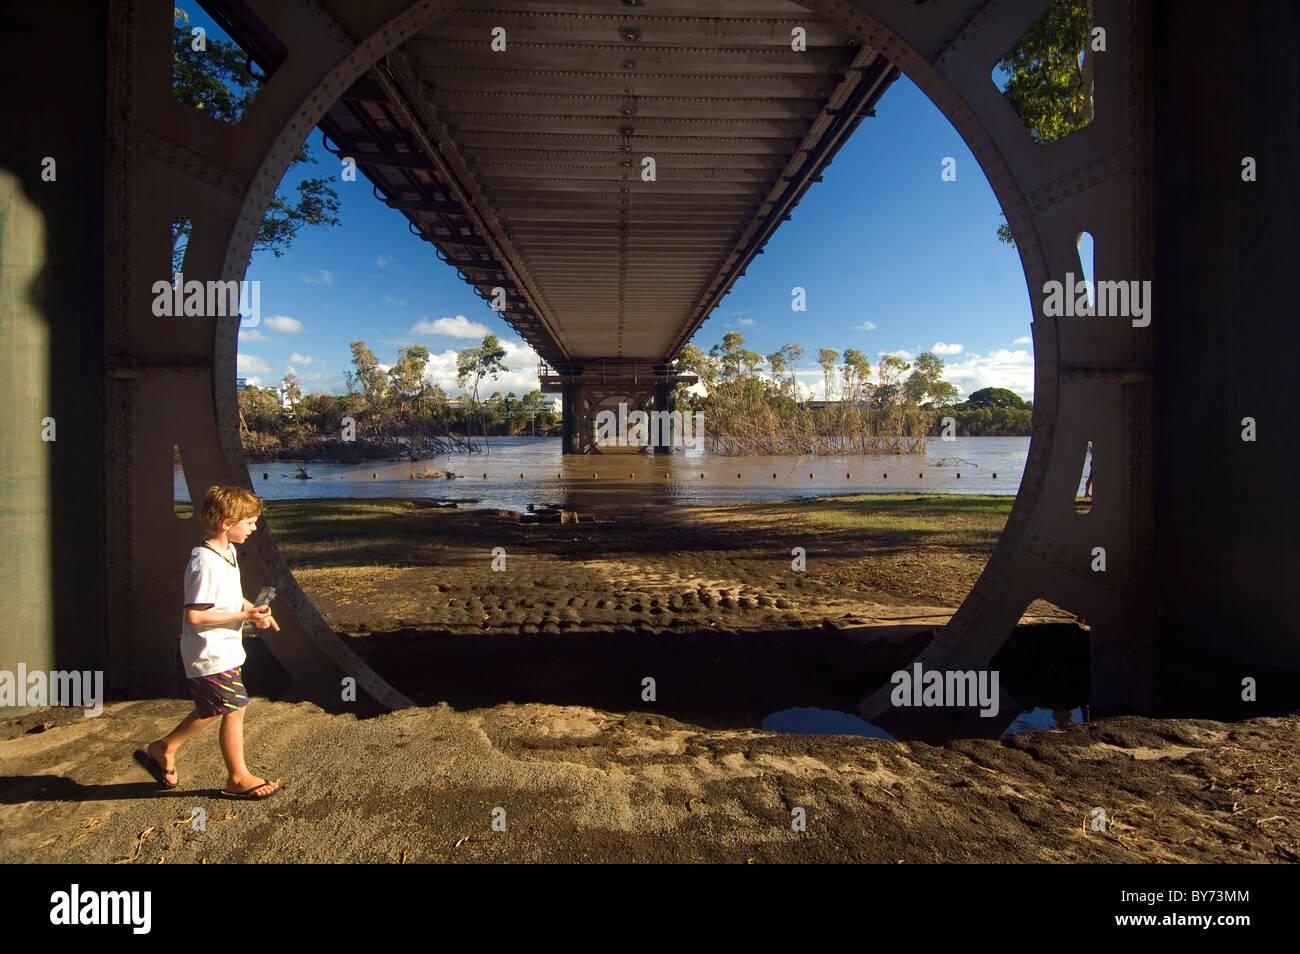 Boy looking at flood damage underneath the Burnett River Bridge, Bundaberg, Queensland, Australia, January 2011. Stock Photo